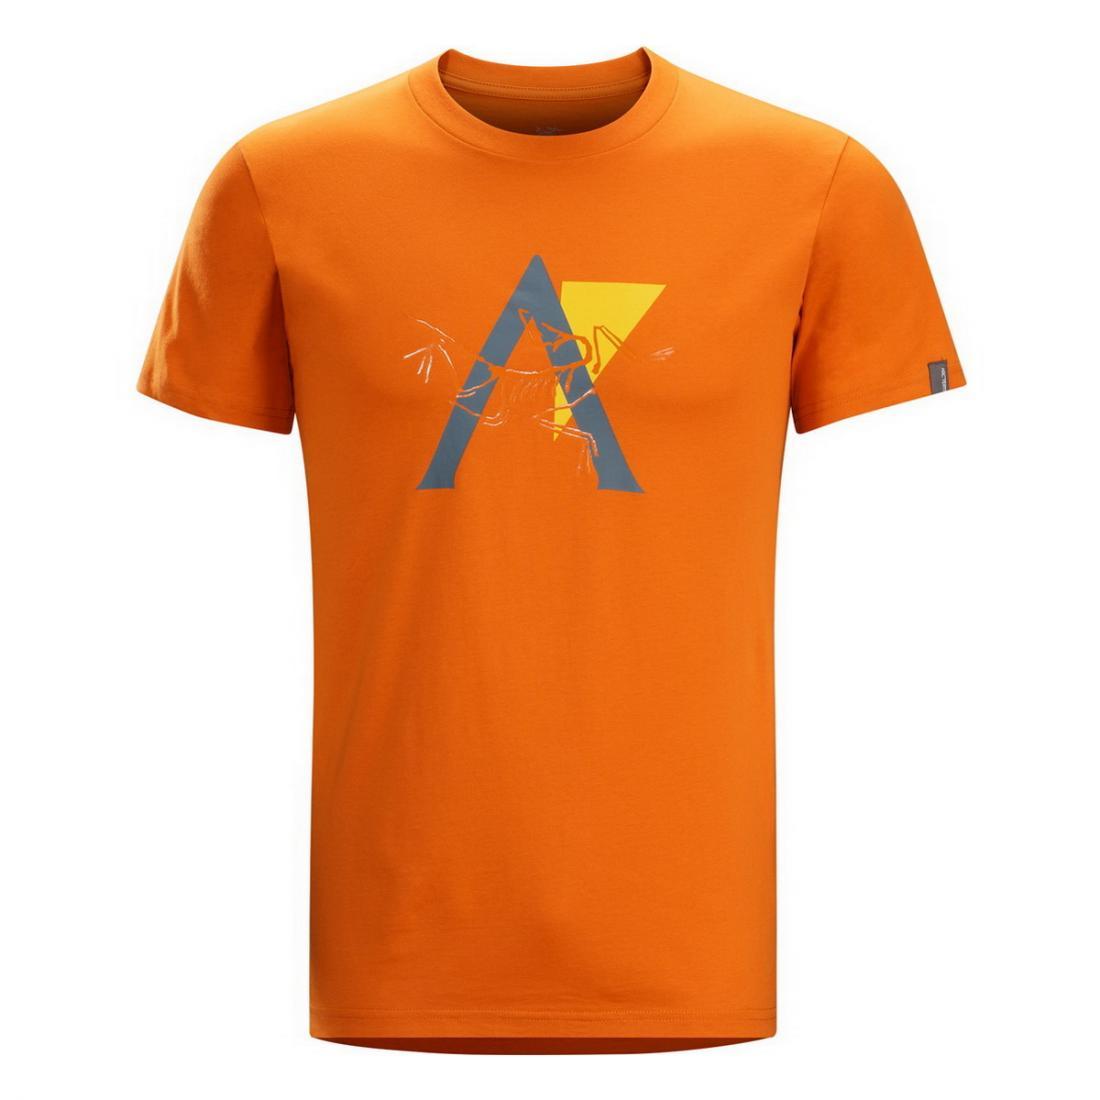 Футболка Stack SS T-Shirt муж.Футболки, поло<br><br><br>Цвет: Оранжевый<br>Размер: M